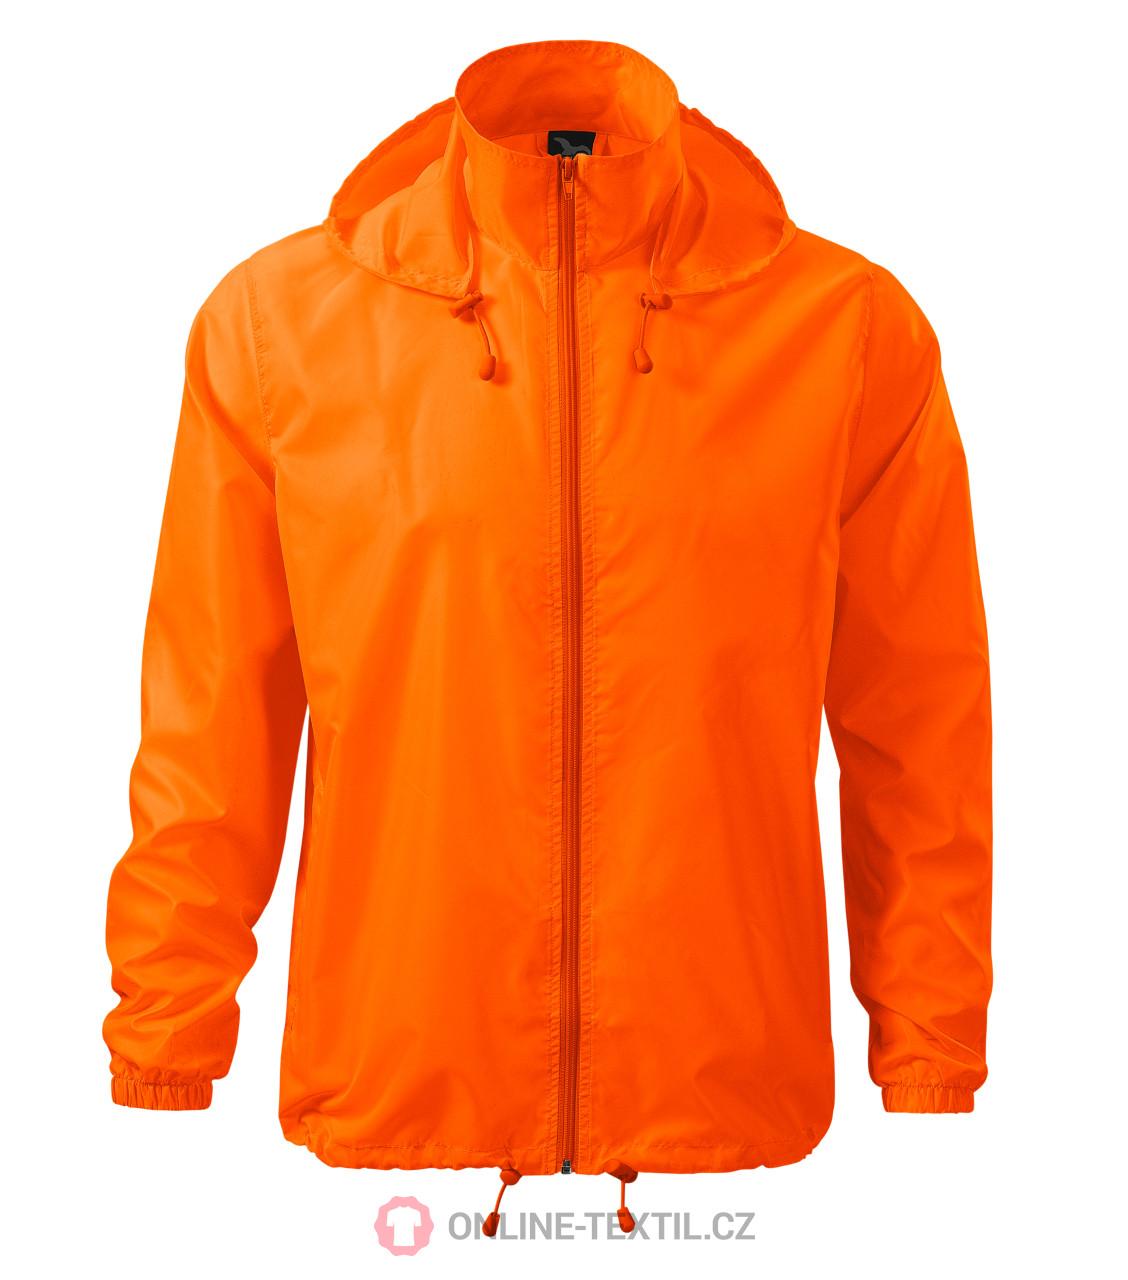 ADLER CZECH Unisex Vetrovka Windy 524 - neon orange z kolekcie ... 77ed73e7360